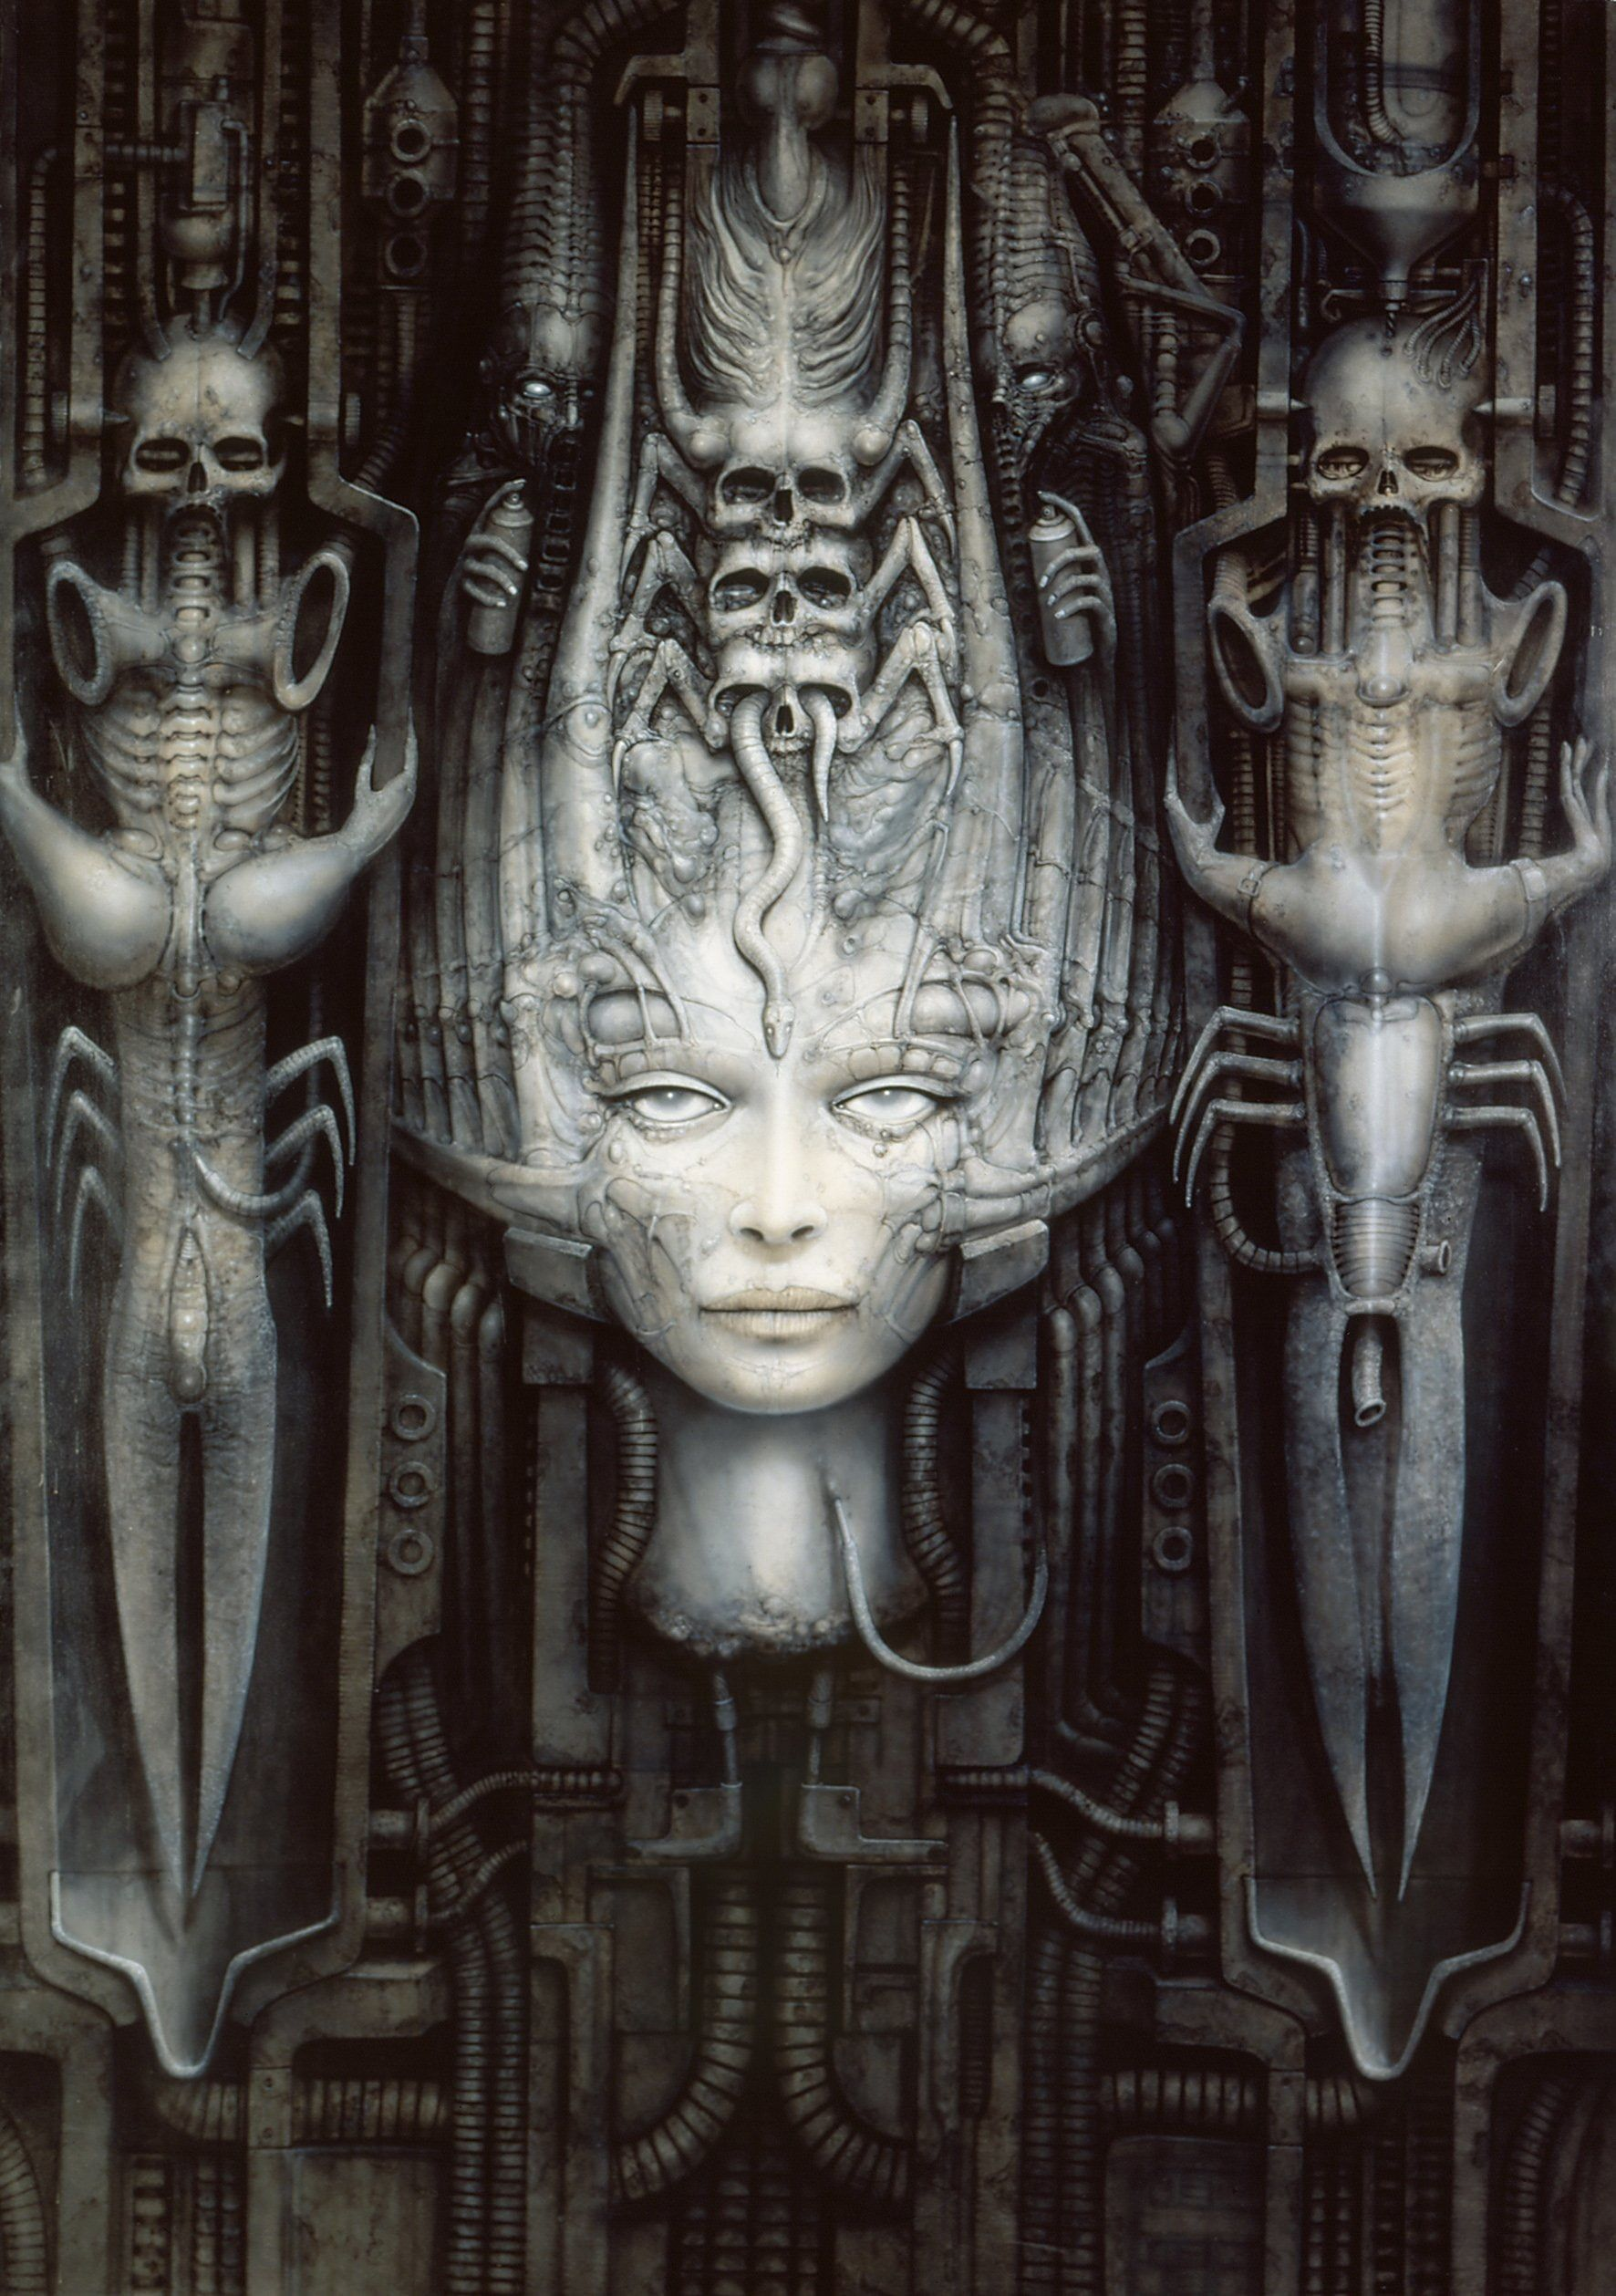 #art #artistic #artwork #Dark #Evil #fantasy